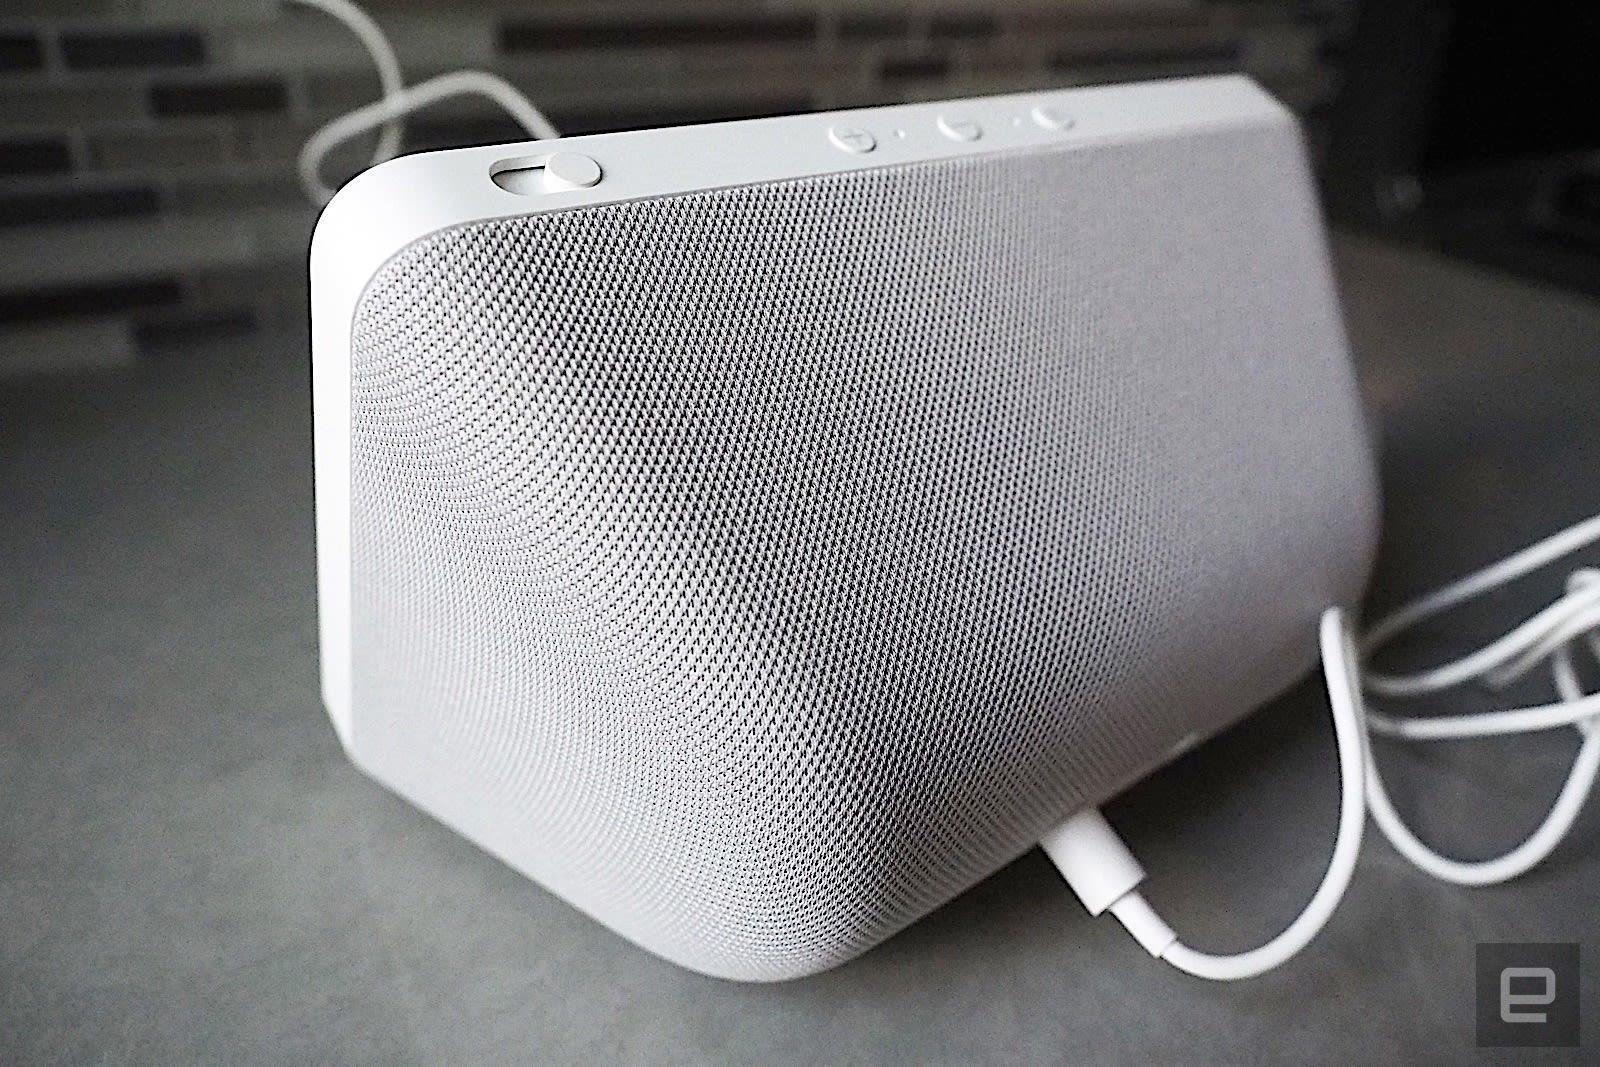 Lenovo Smart Display 7 vs. Amazon Echo Show 8